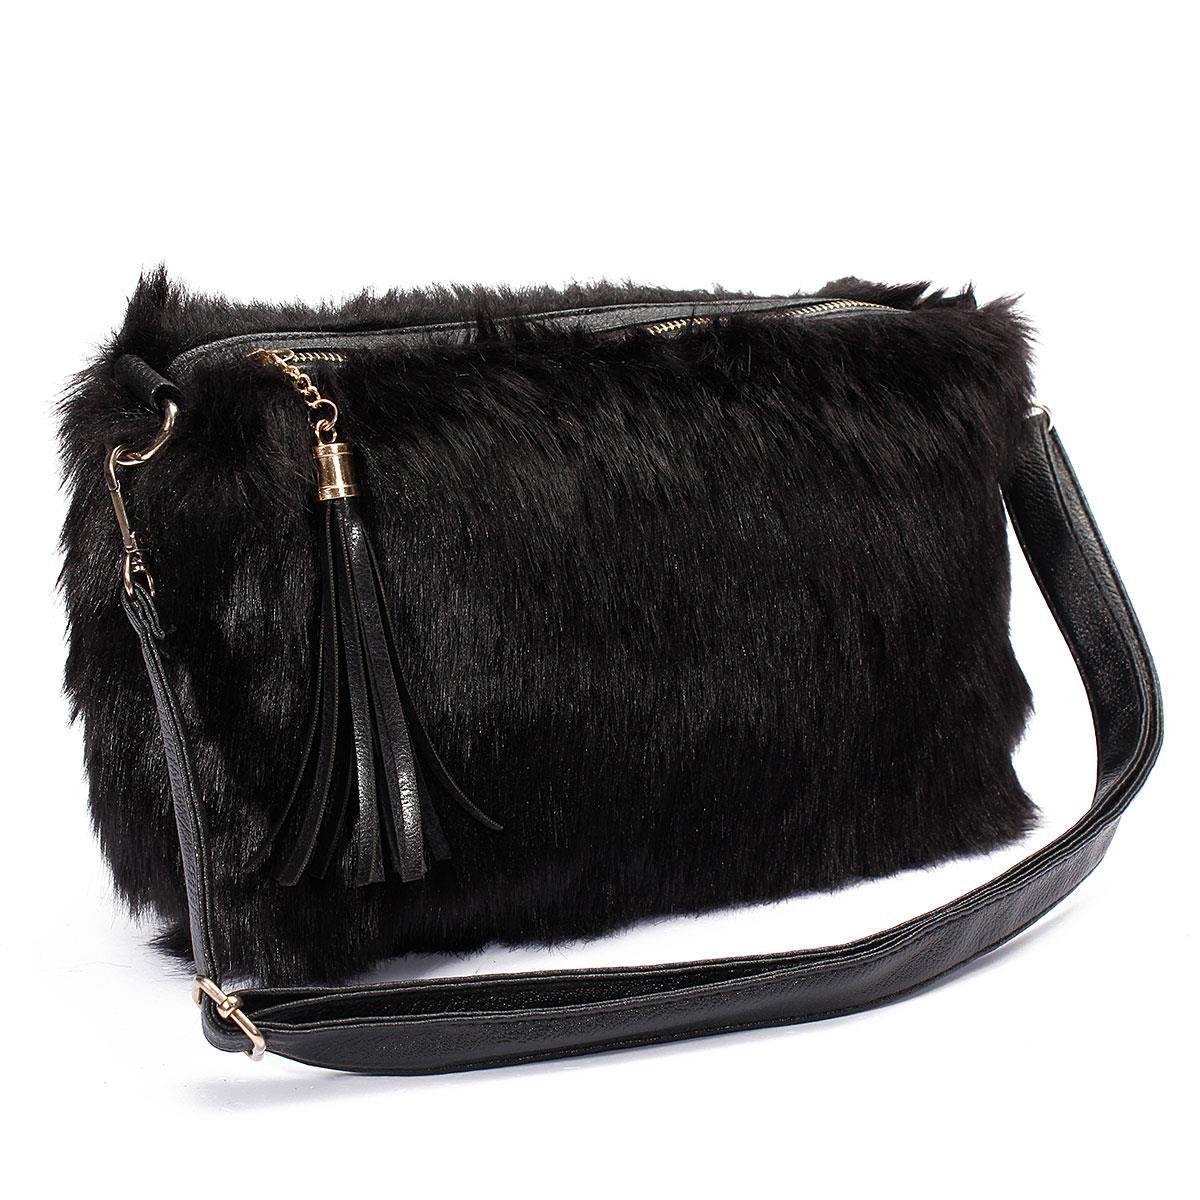 Ladies Black Handbags Sale